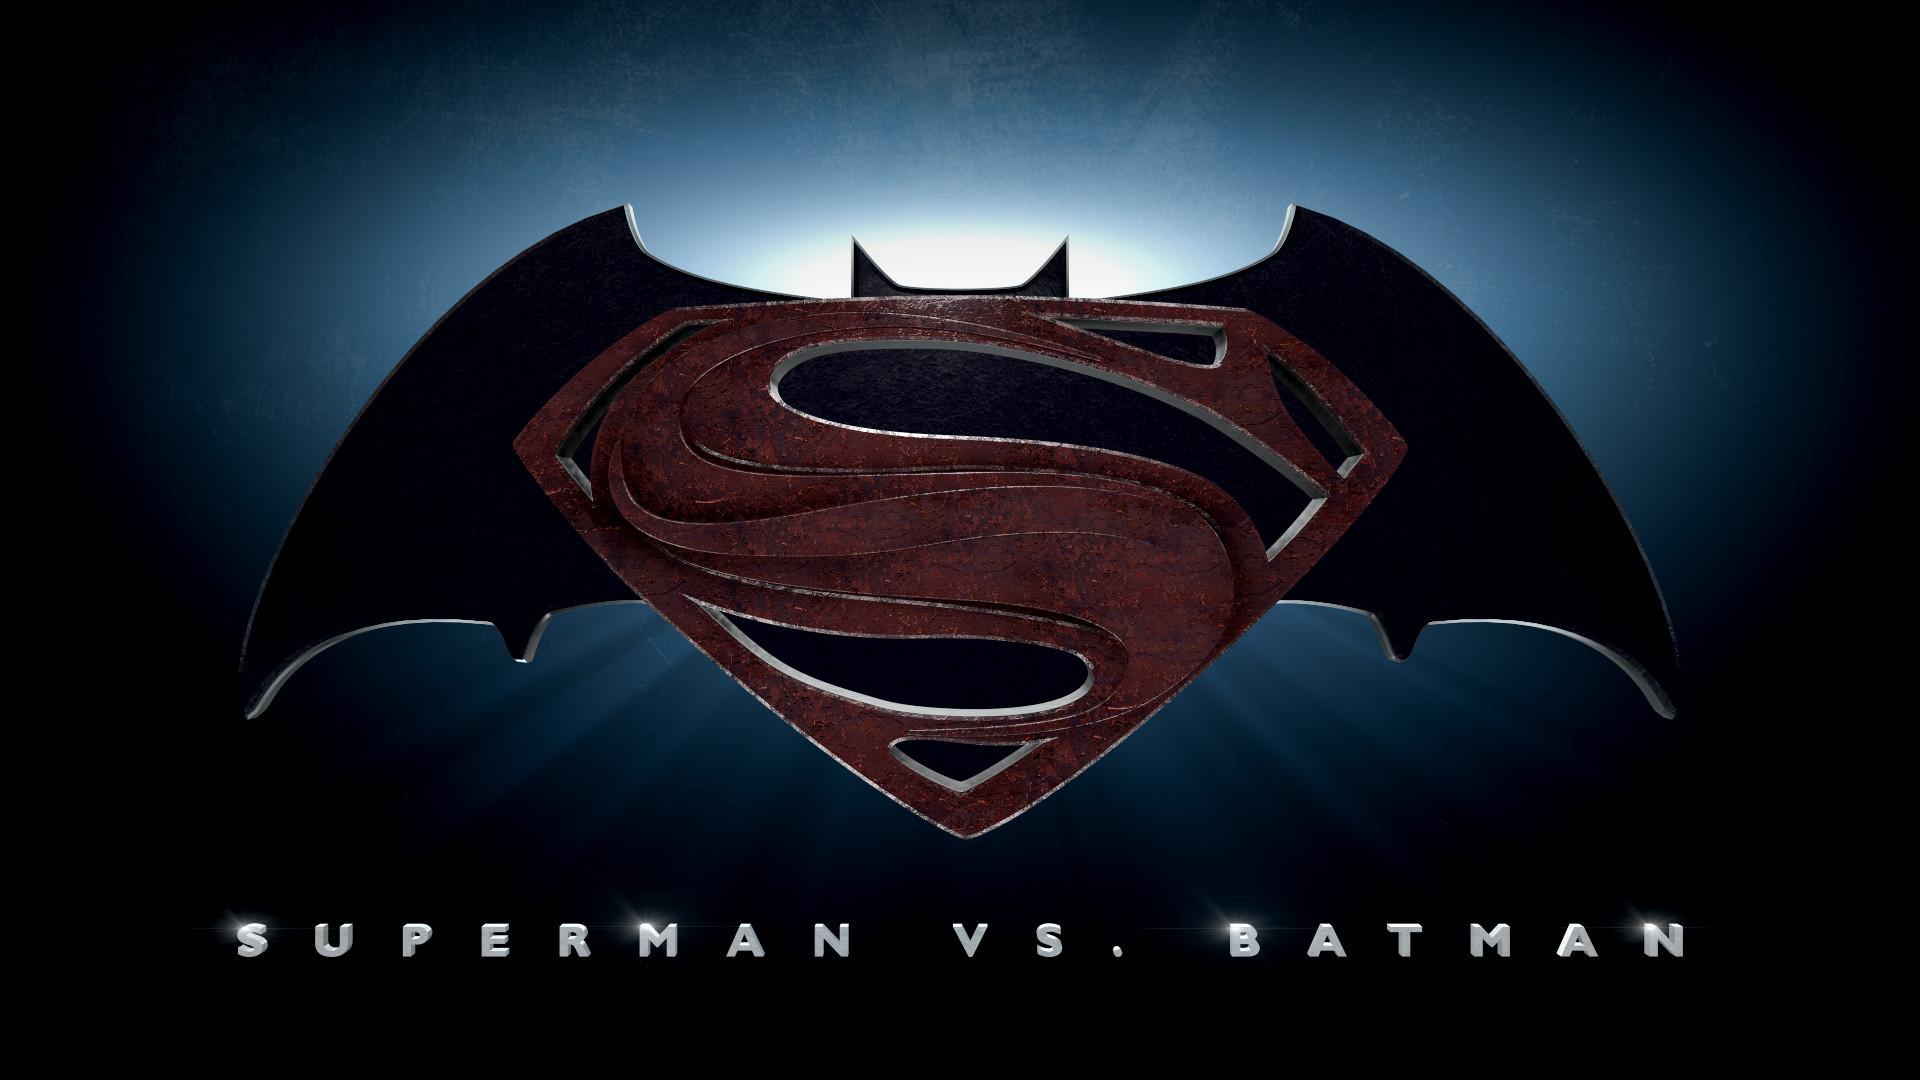 Batman v Superman: Dawn of Justice Free HD Wallpapers